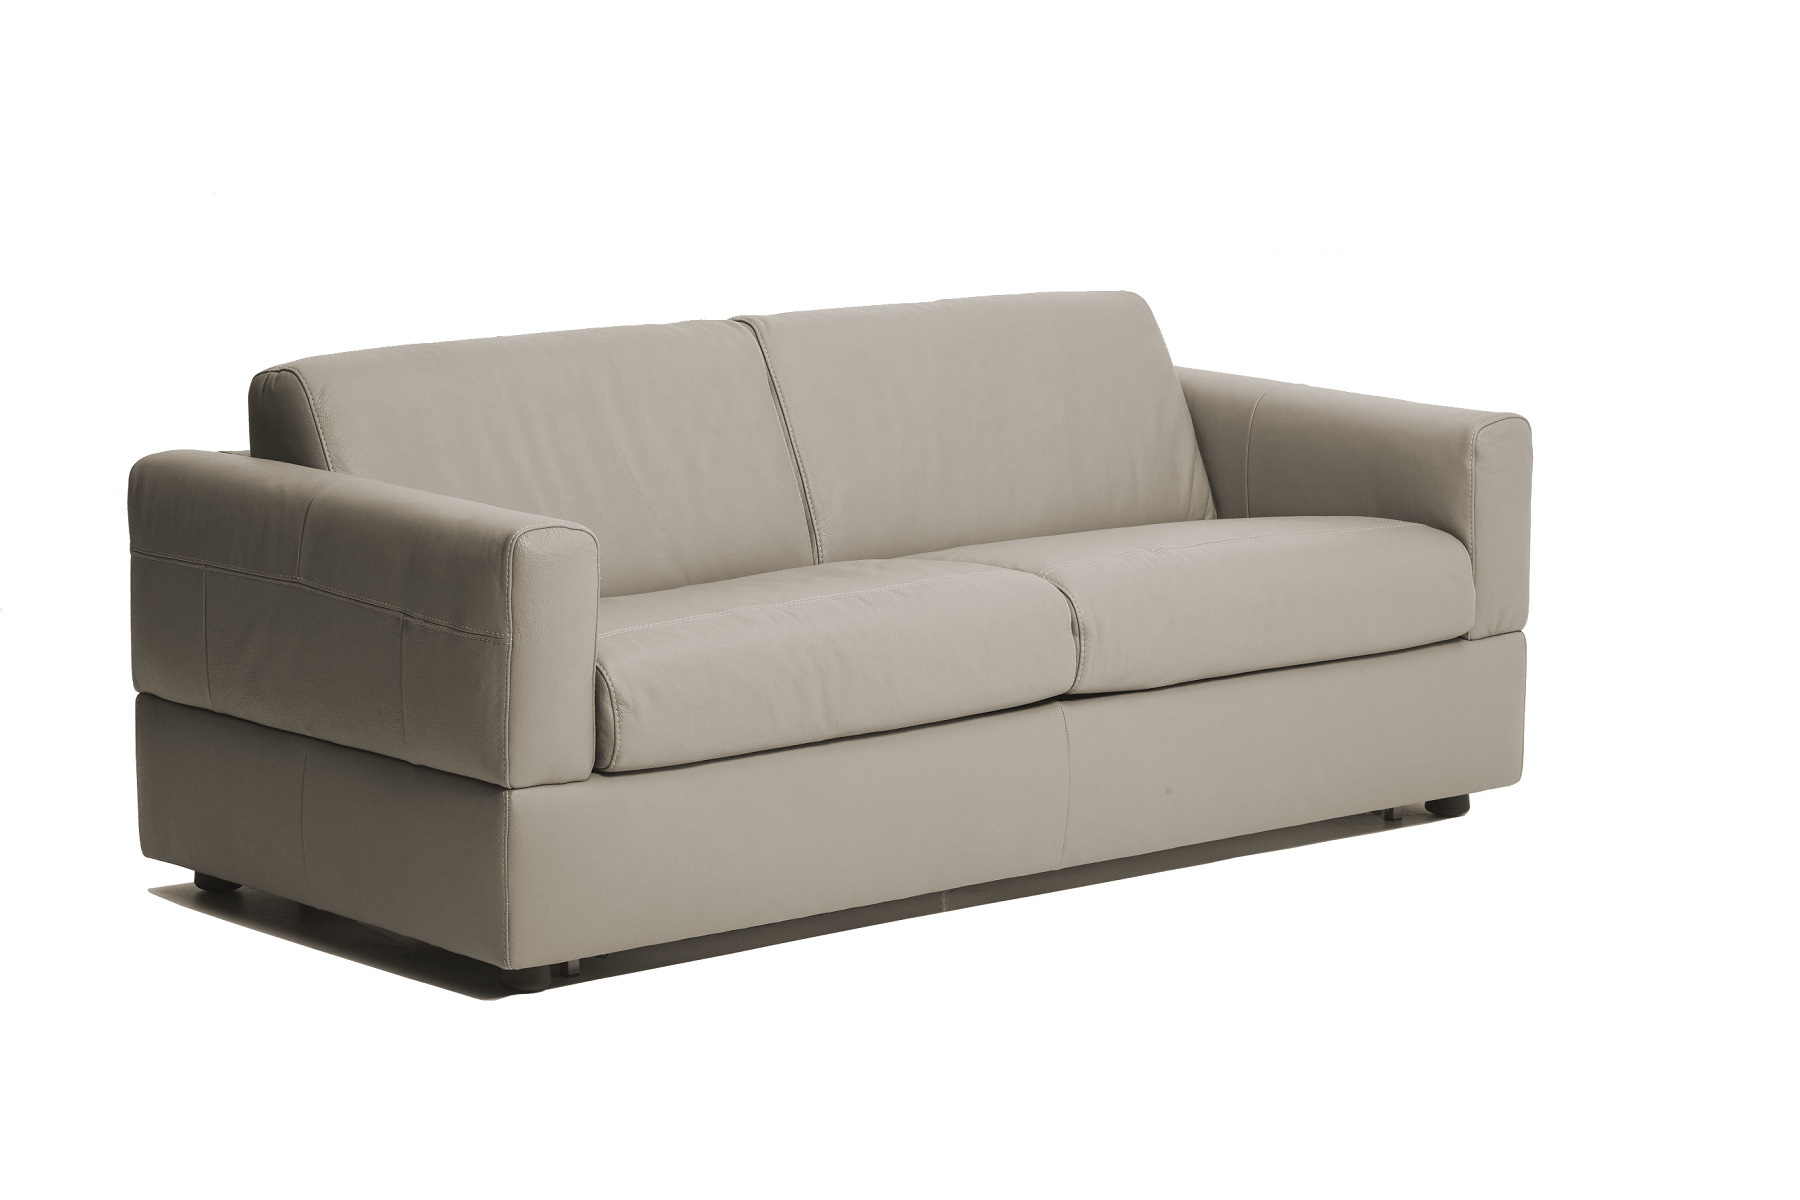 Visconti Leather Sofa Bed - Dark Grey